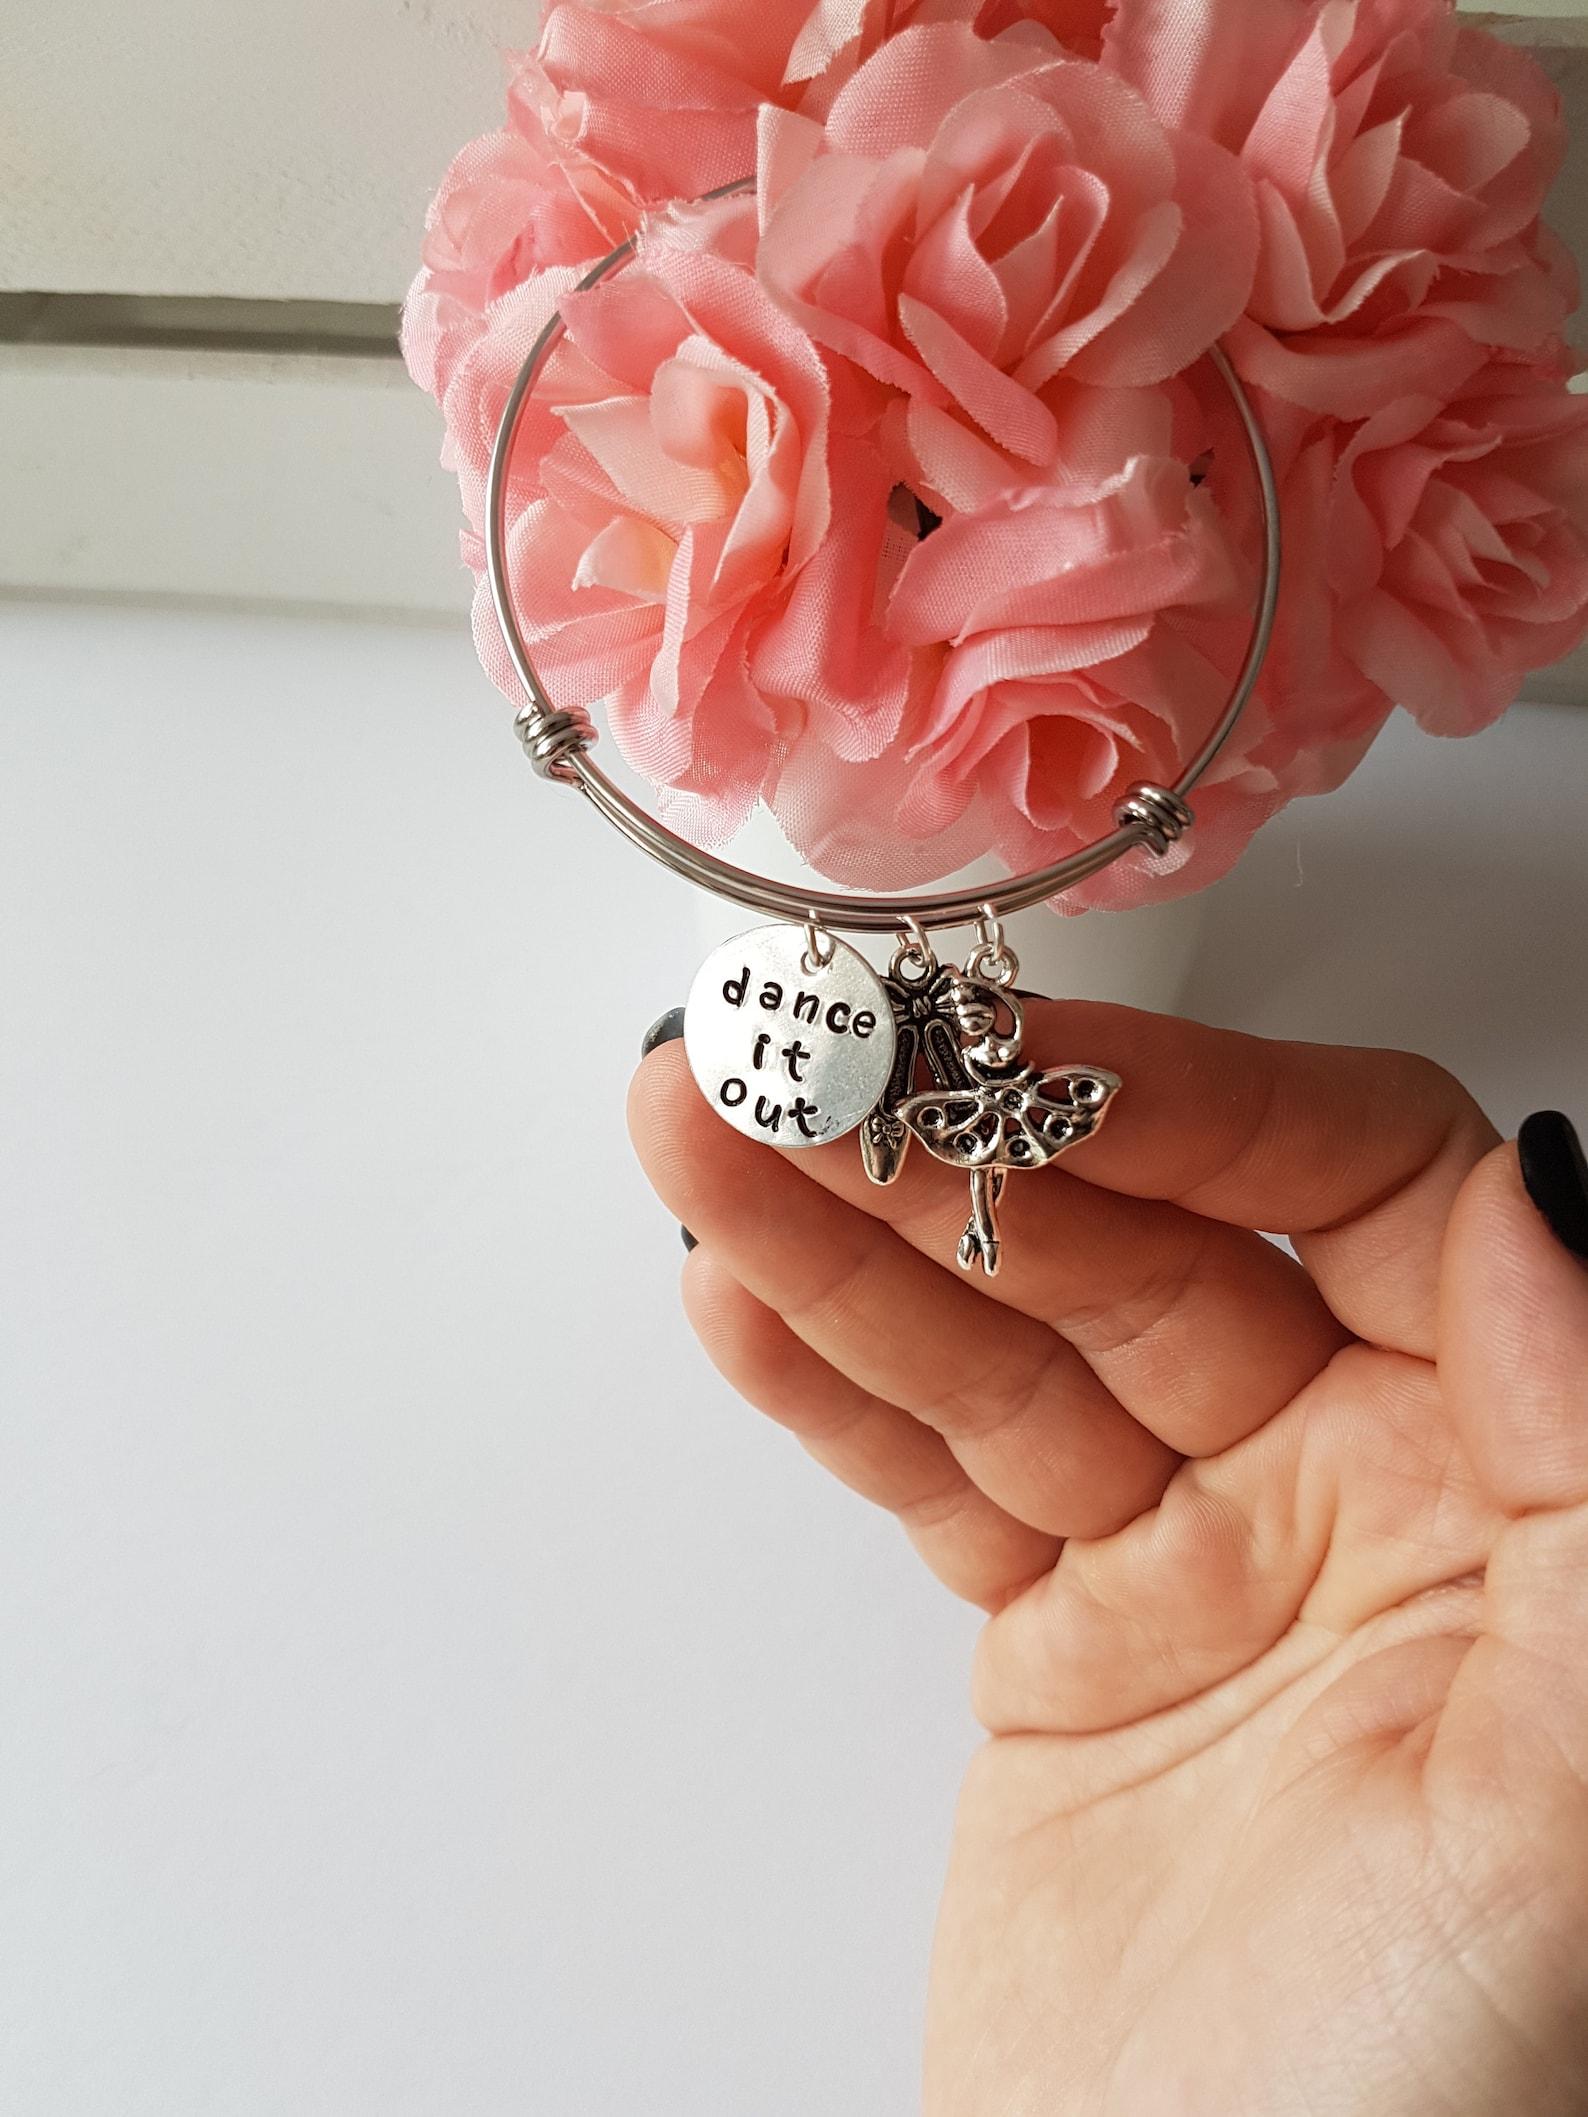 charm bracelet, adjustable bangle bracelet with ballerina, ballet shoes charm bracelet, dance it out stamped bracelet, friends b